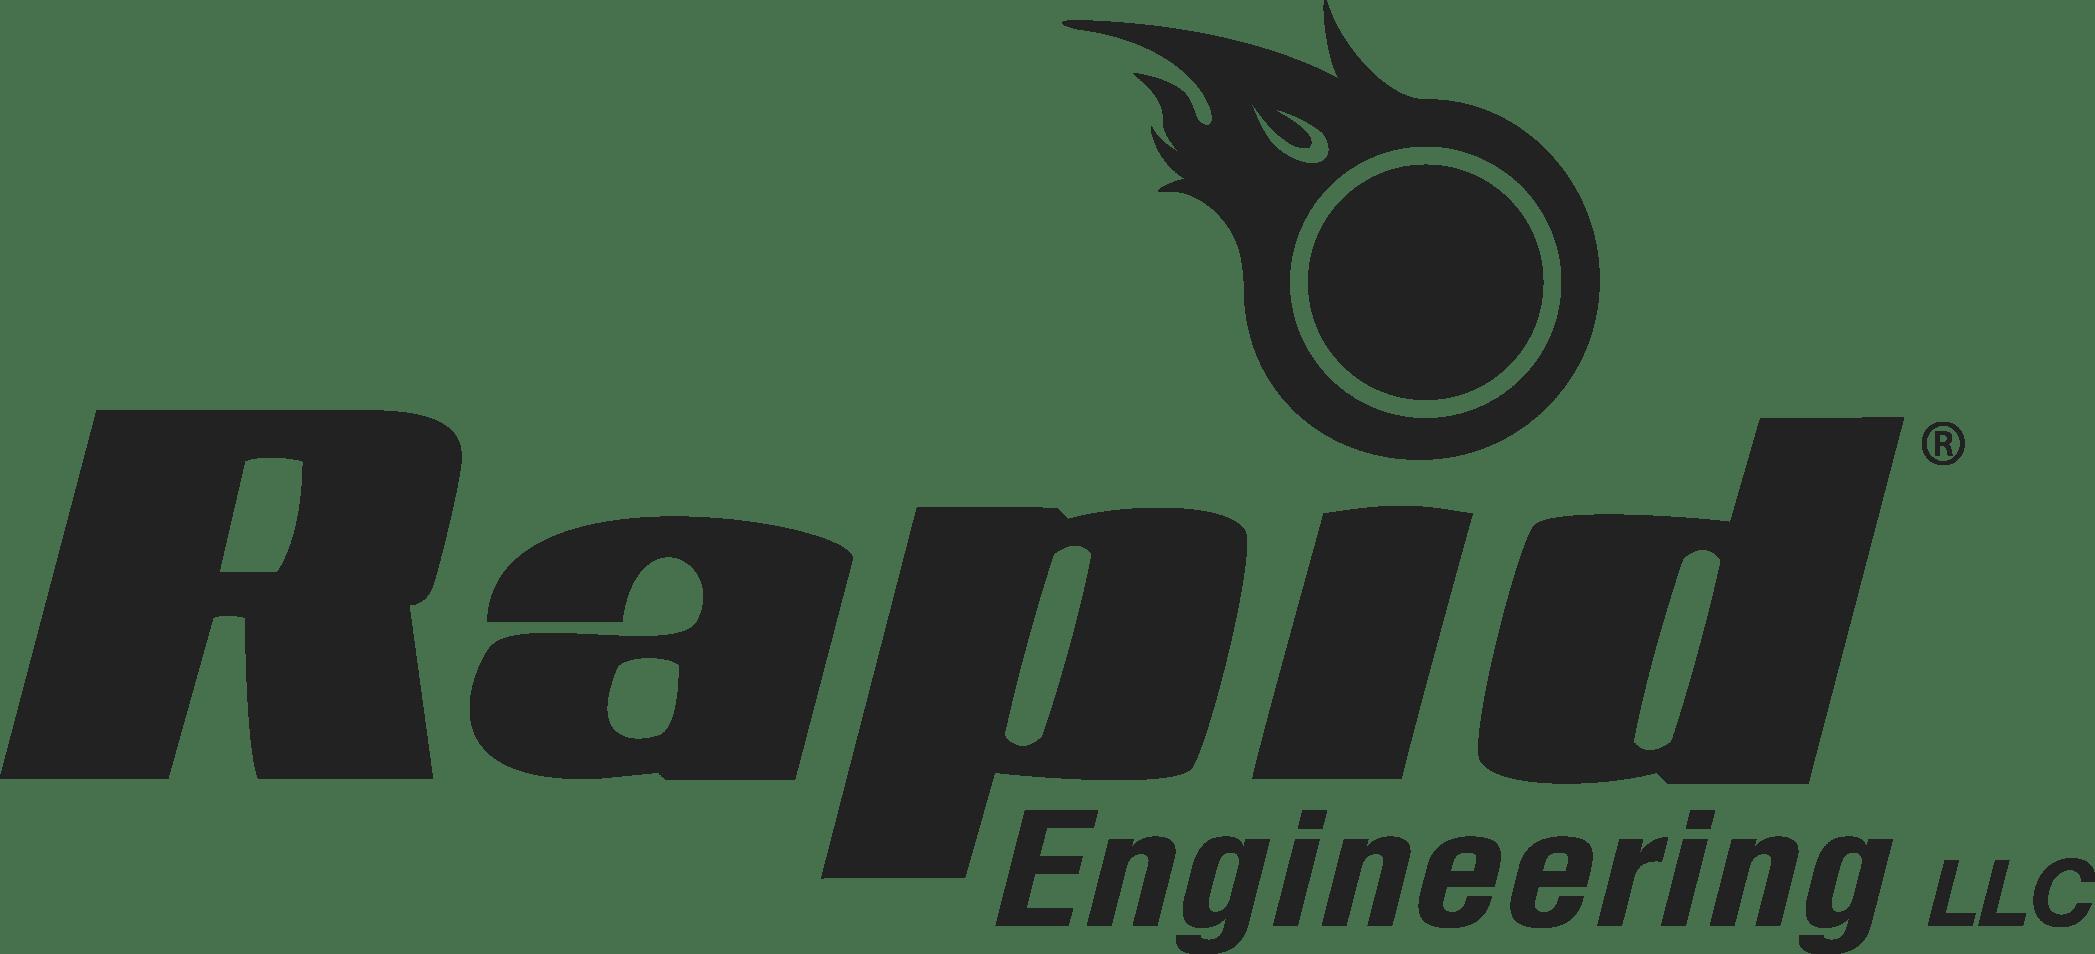 Rapid Engineering logo